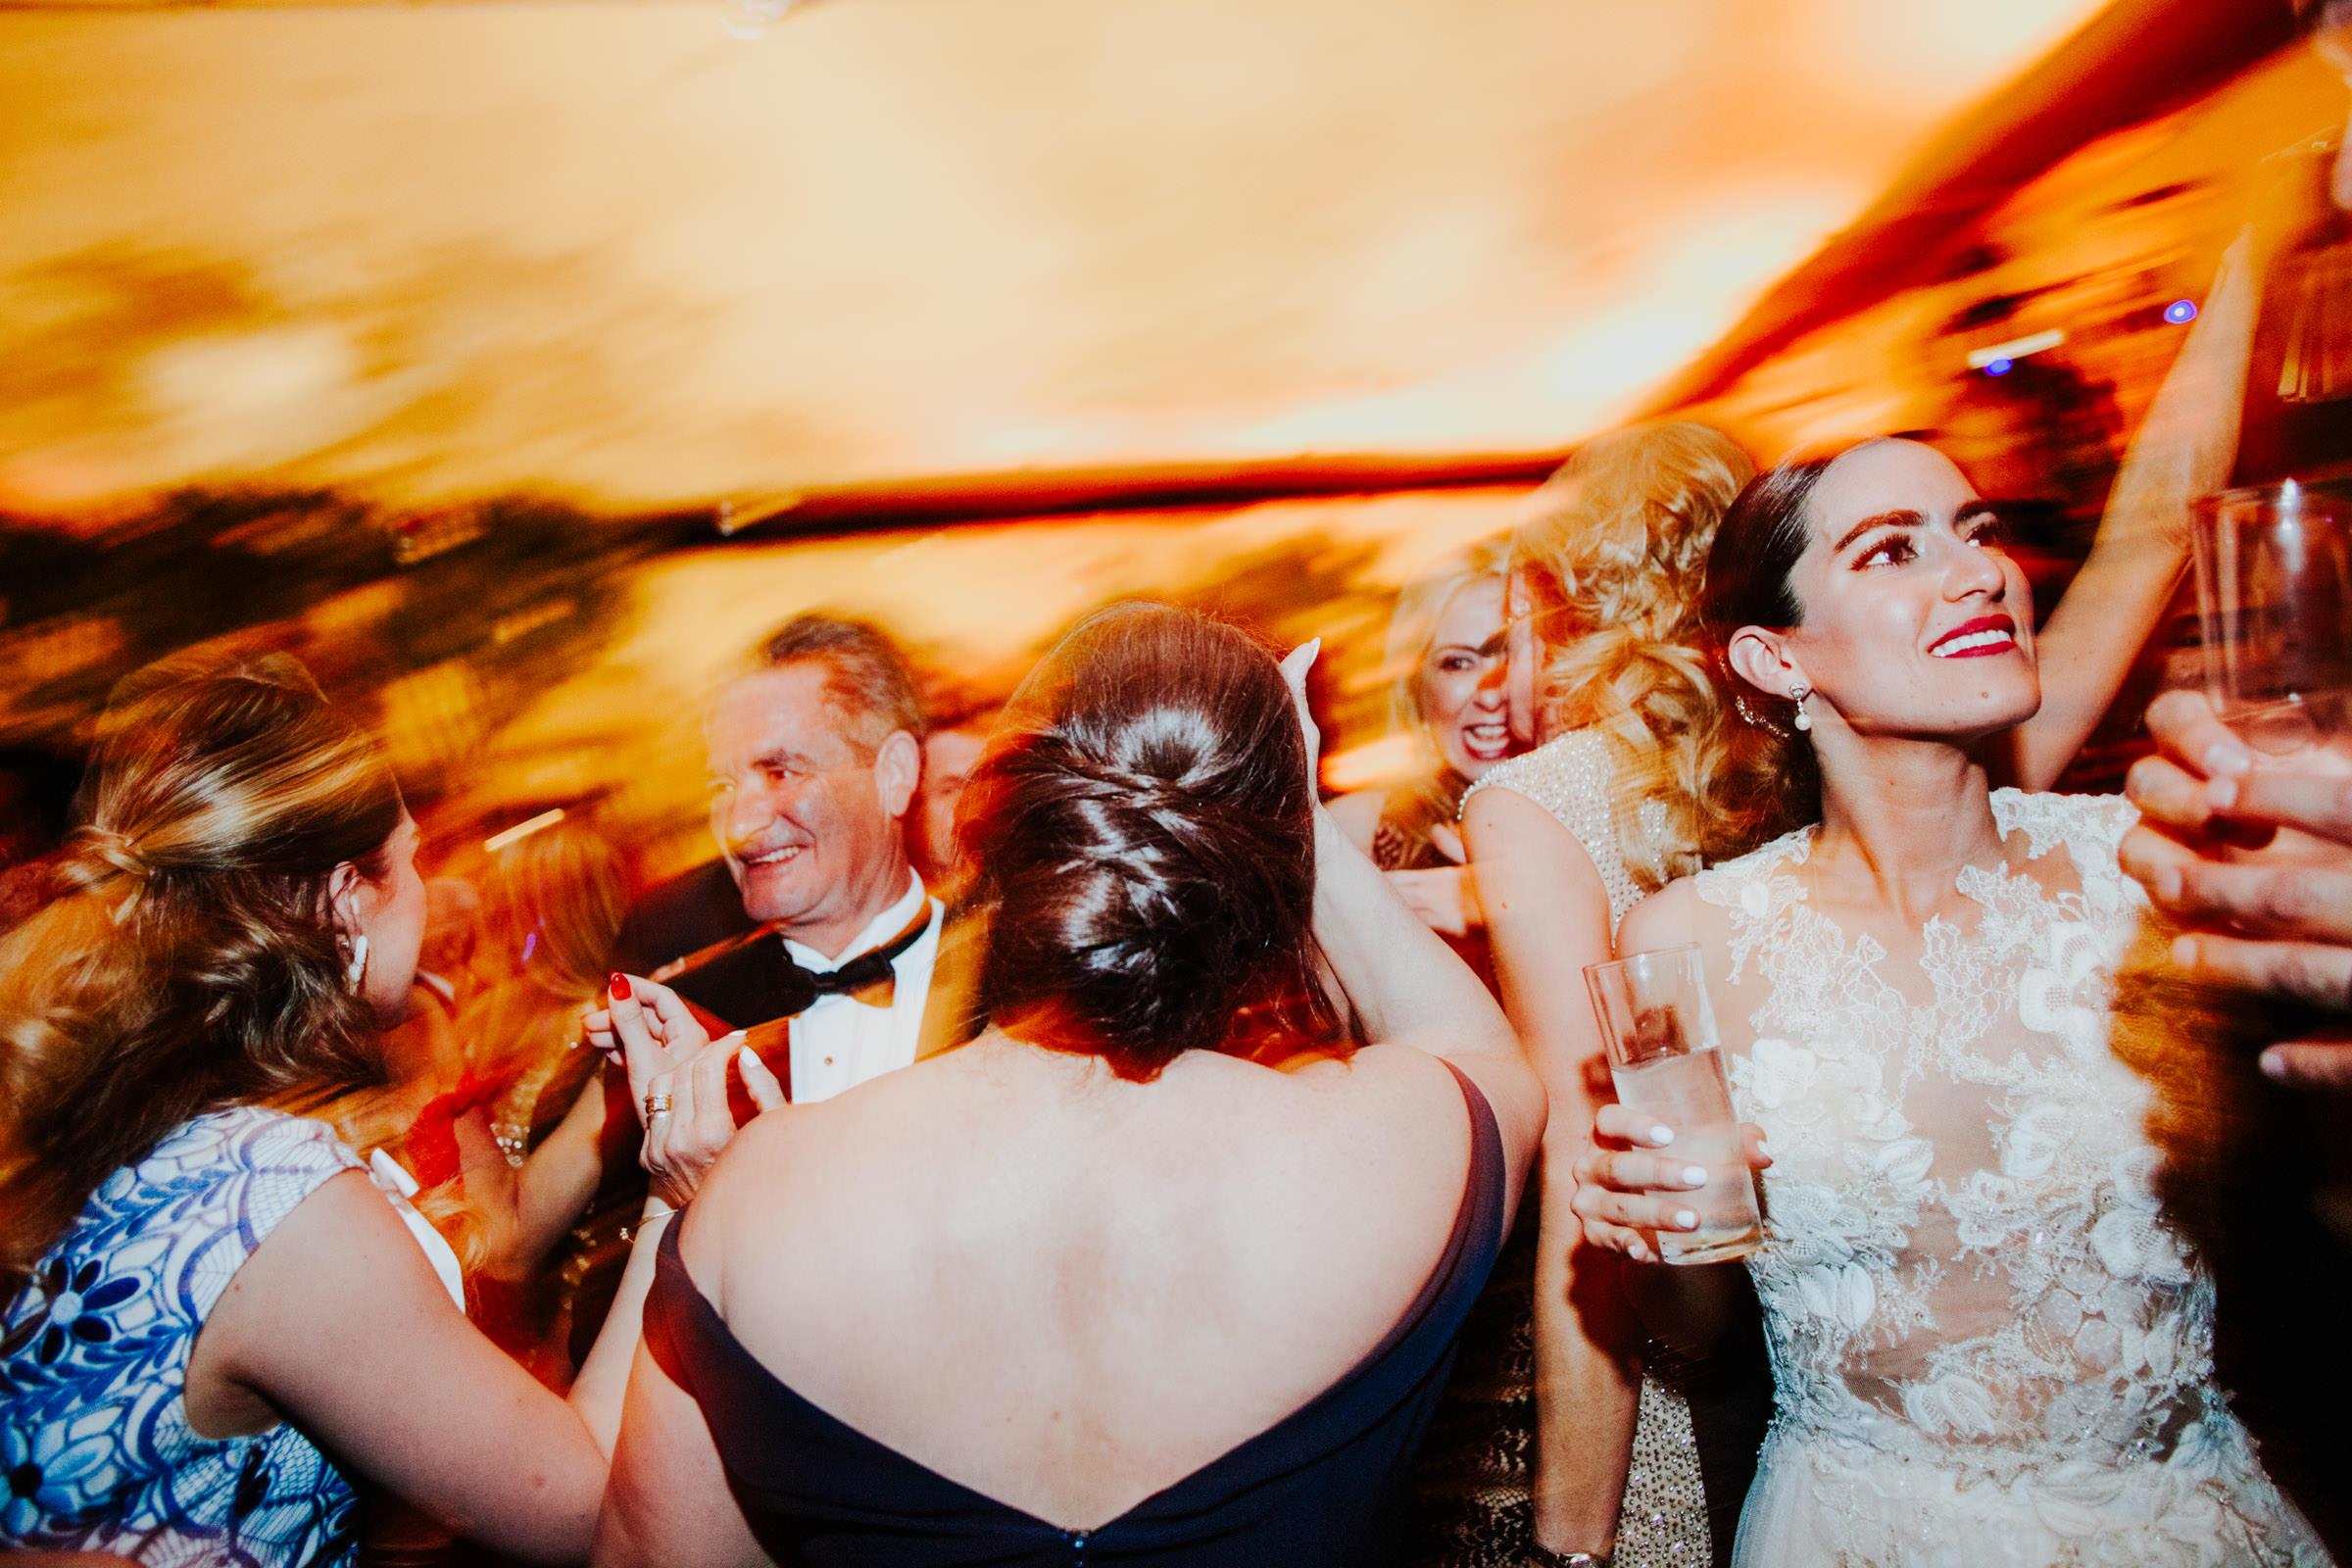 San-Miguel-de-Allende-Wedding-Photography-Parroquia-Instituto-Boda-Fotografia-Fer-Sergio-Pierce-Lifestyle-Photography0058.JPG